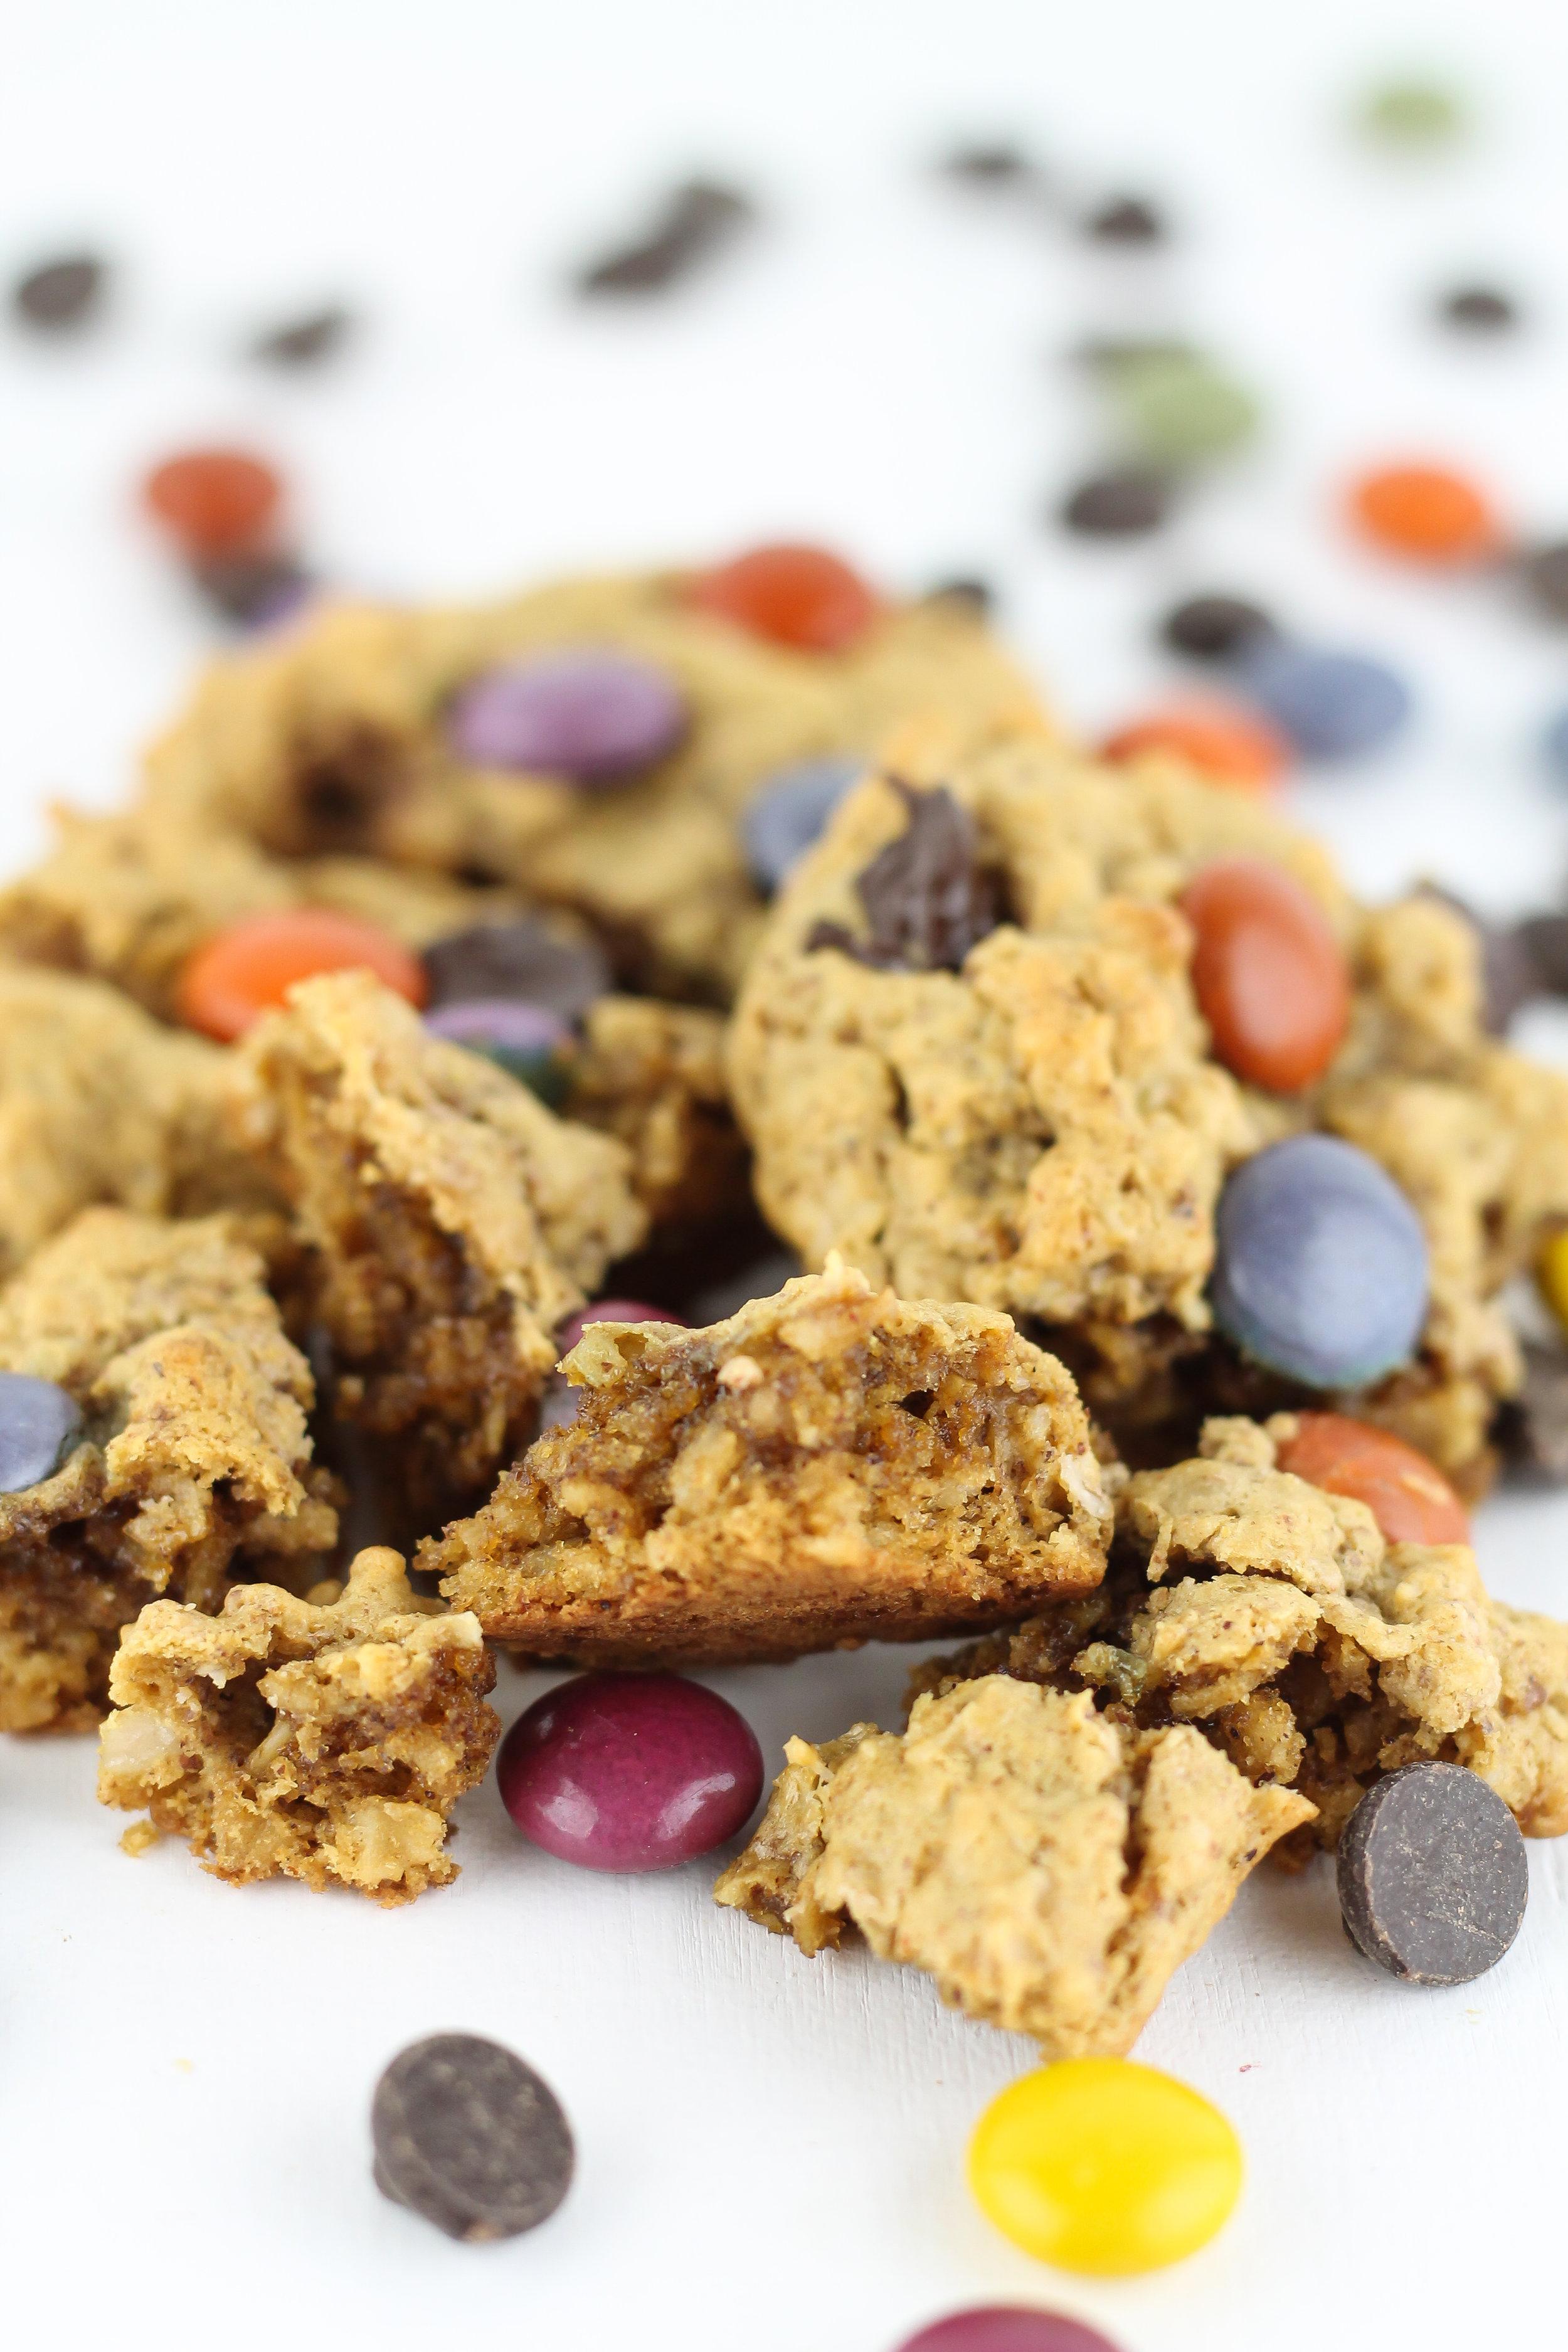 monster cookies, gluten free, gluten free oats, quick oats, holiday cookies, christmas cookies, low sugar, healthy cookies,